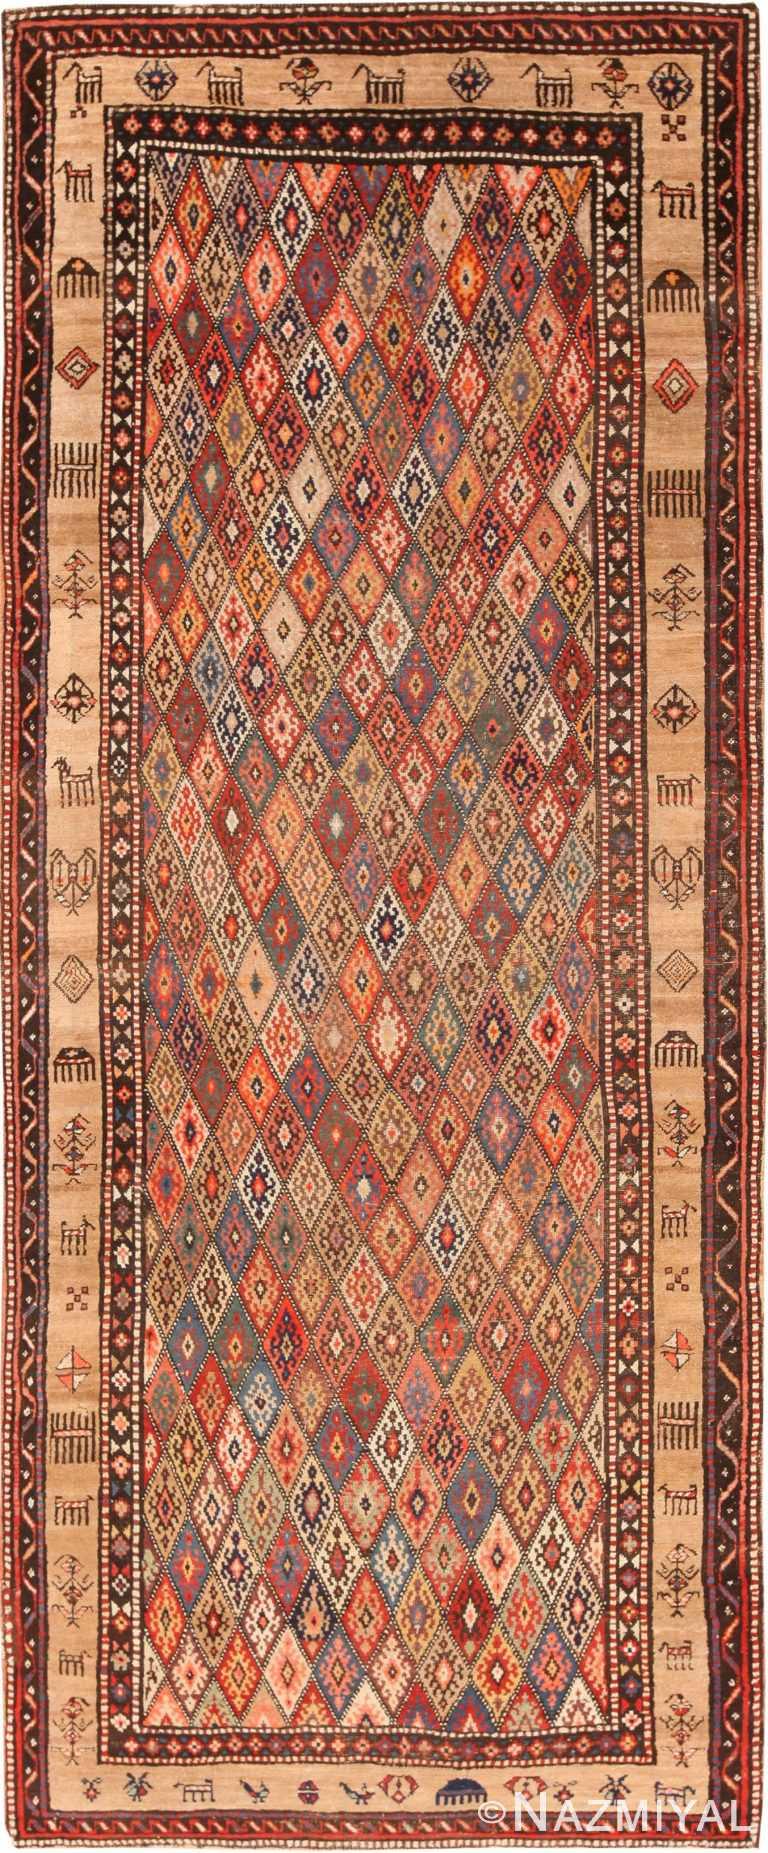 Antique Persian Bakshaish Area Rug 70953 by Nazmiyal Antique Rugs